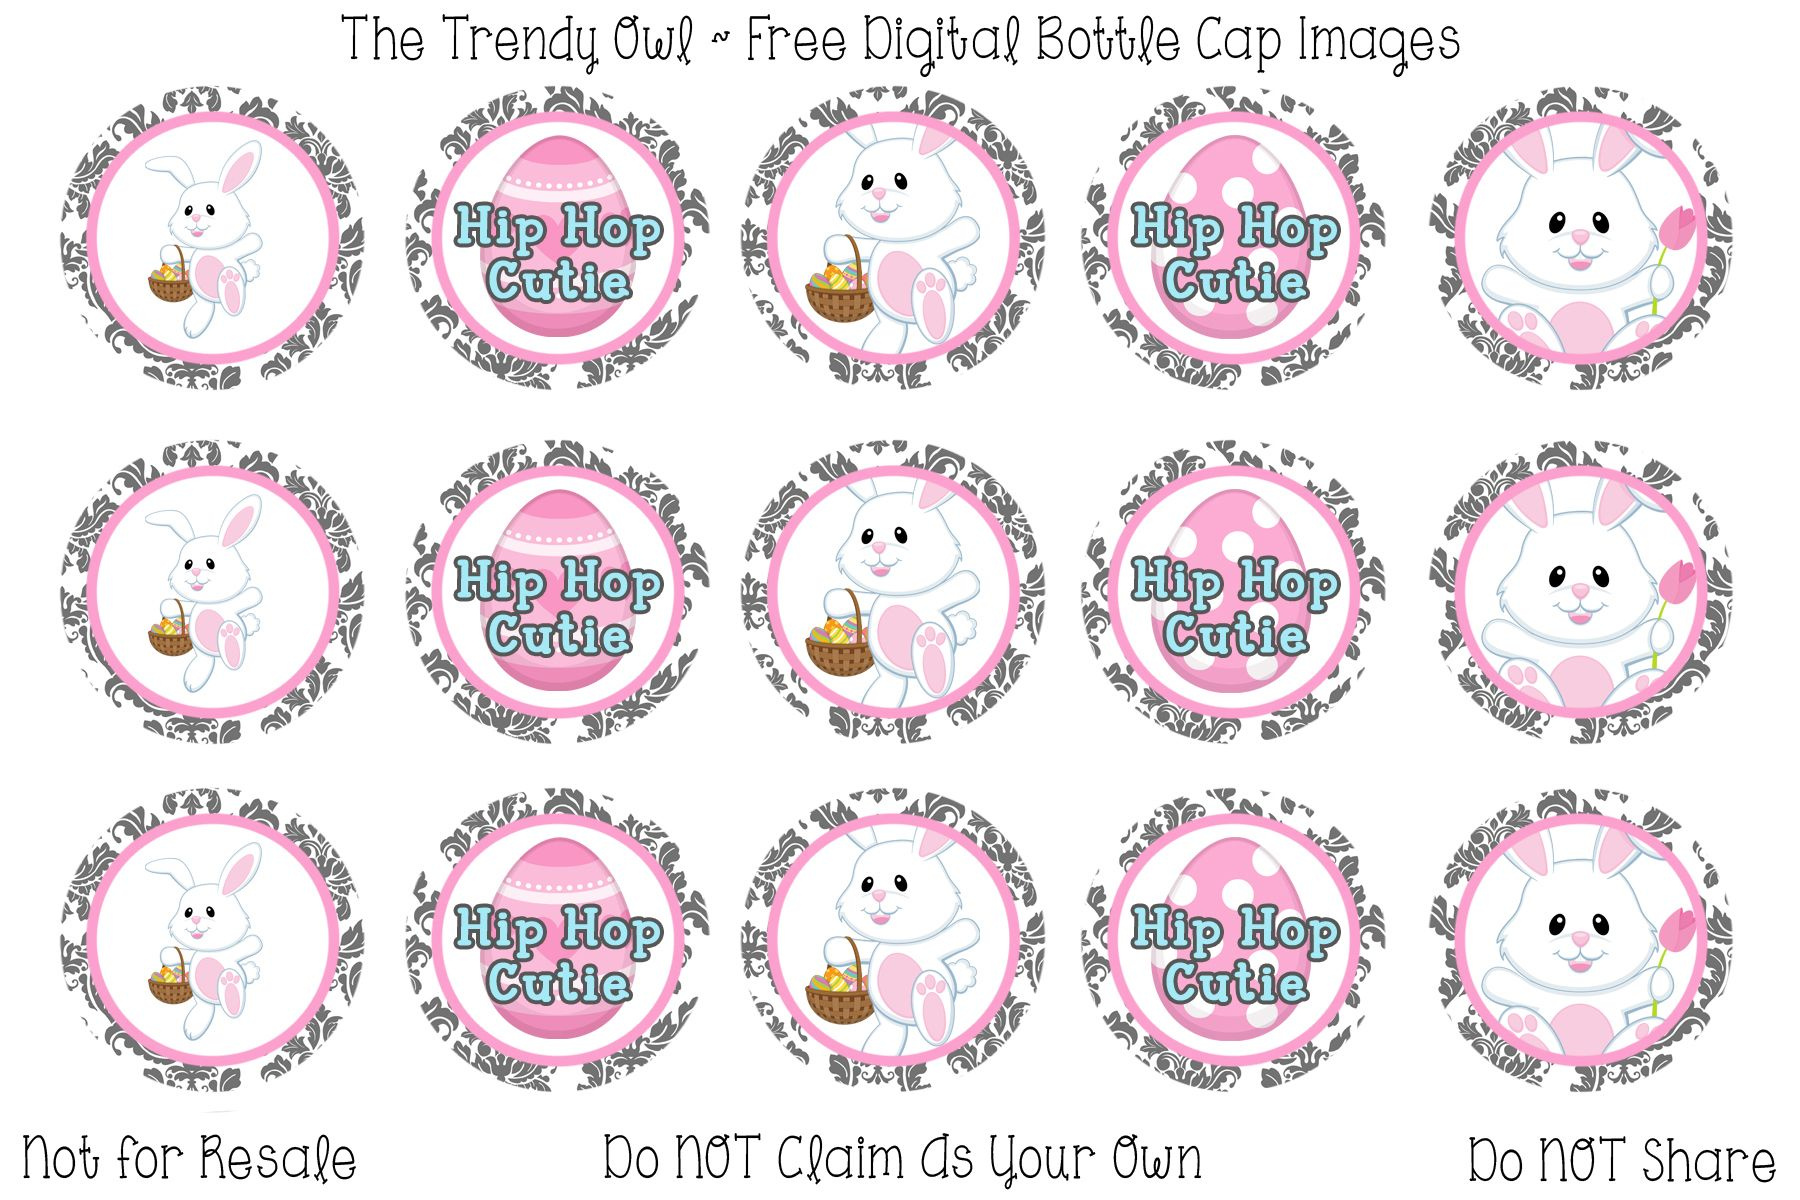 Easter <3 Retired images uploaded as freebies! Enjoy! ~ FREE Digital Bottle Cap Images!! https://www.facebook.com/thetrendyowlUS http://www.thetrendyowl.com